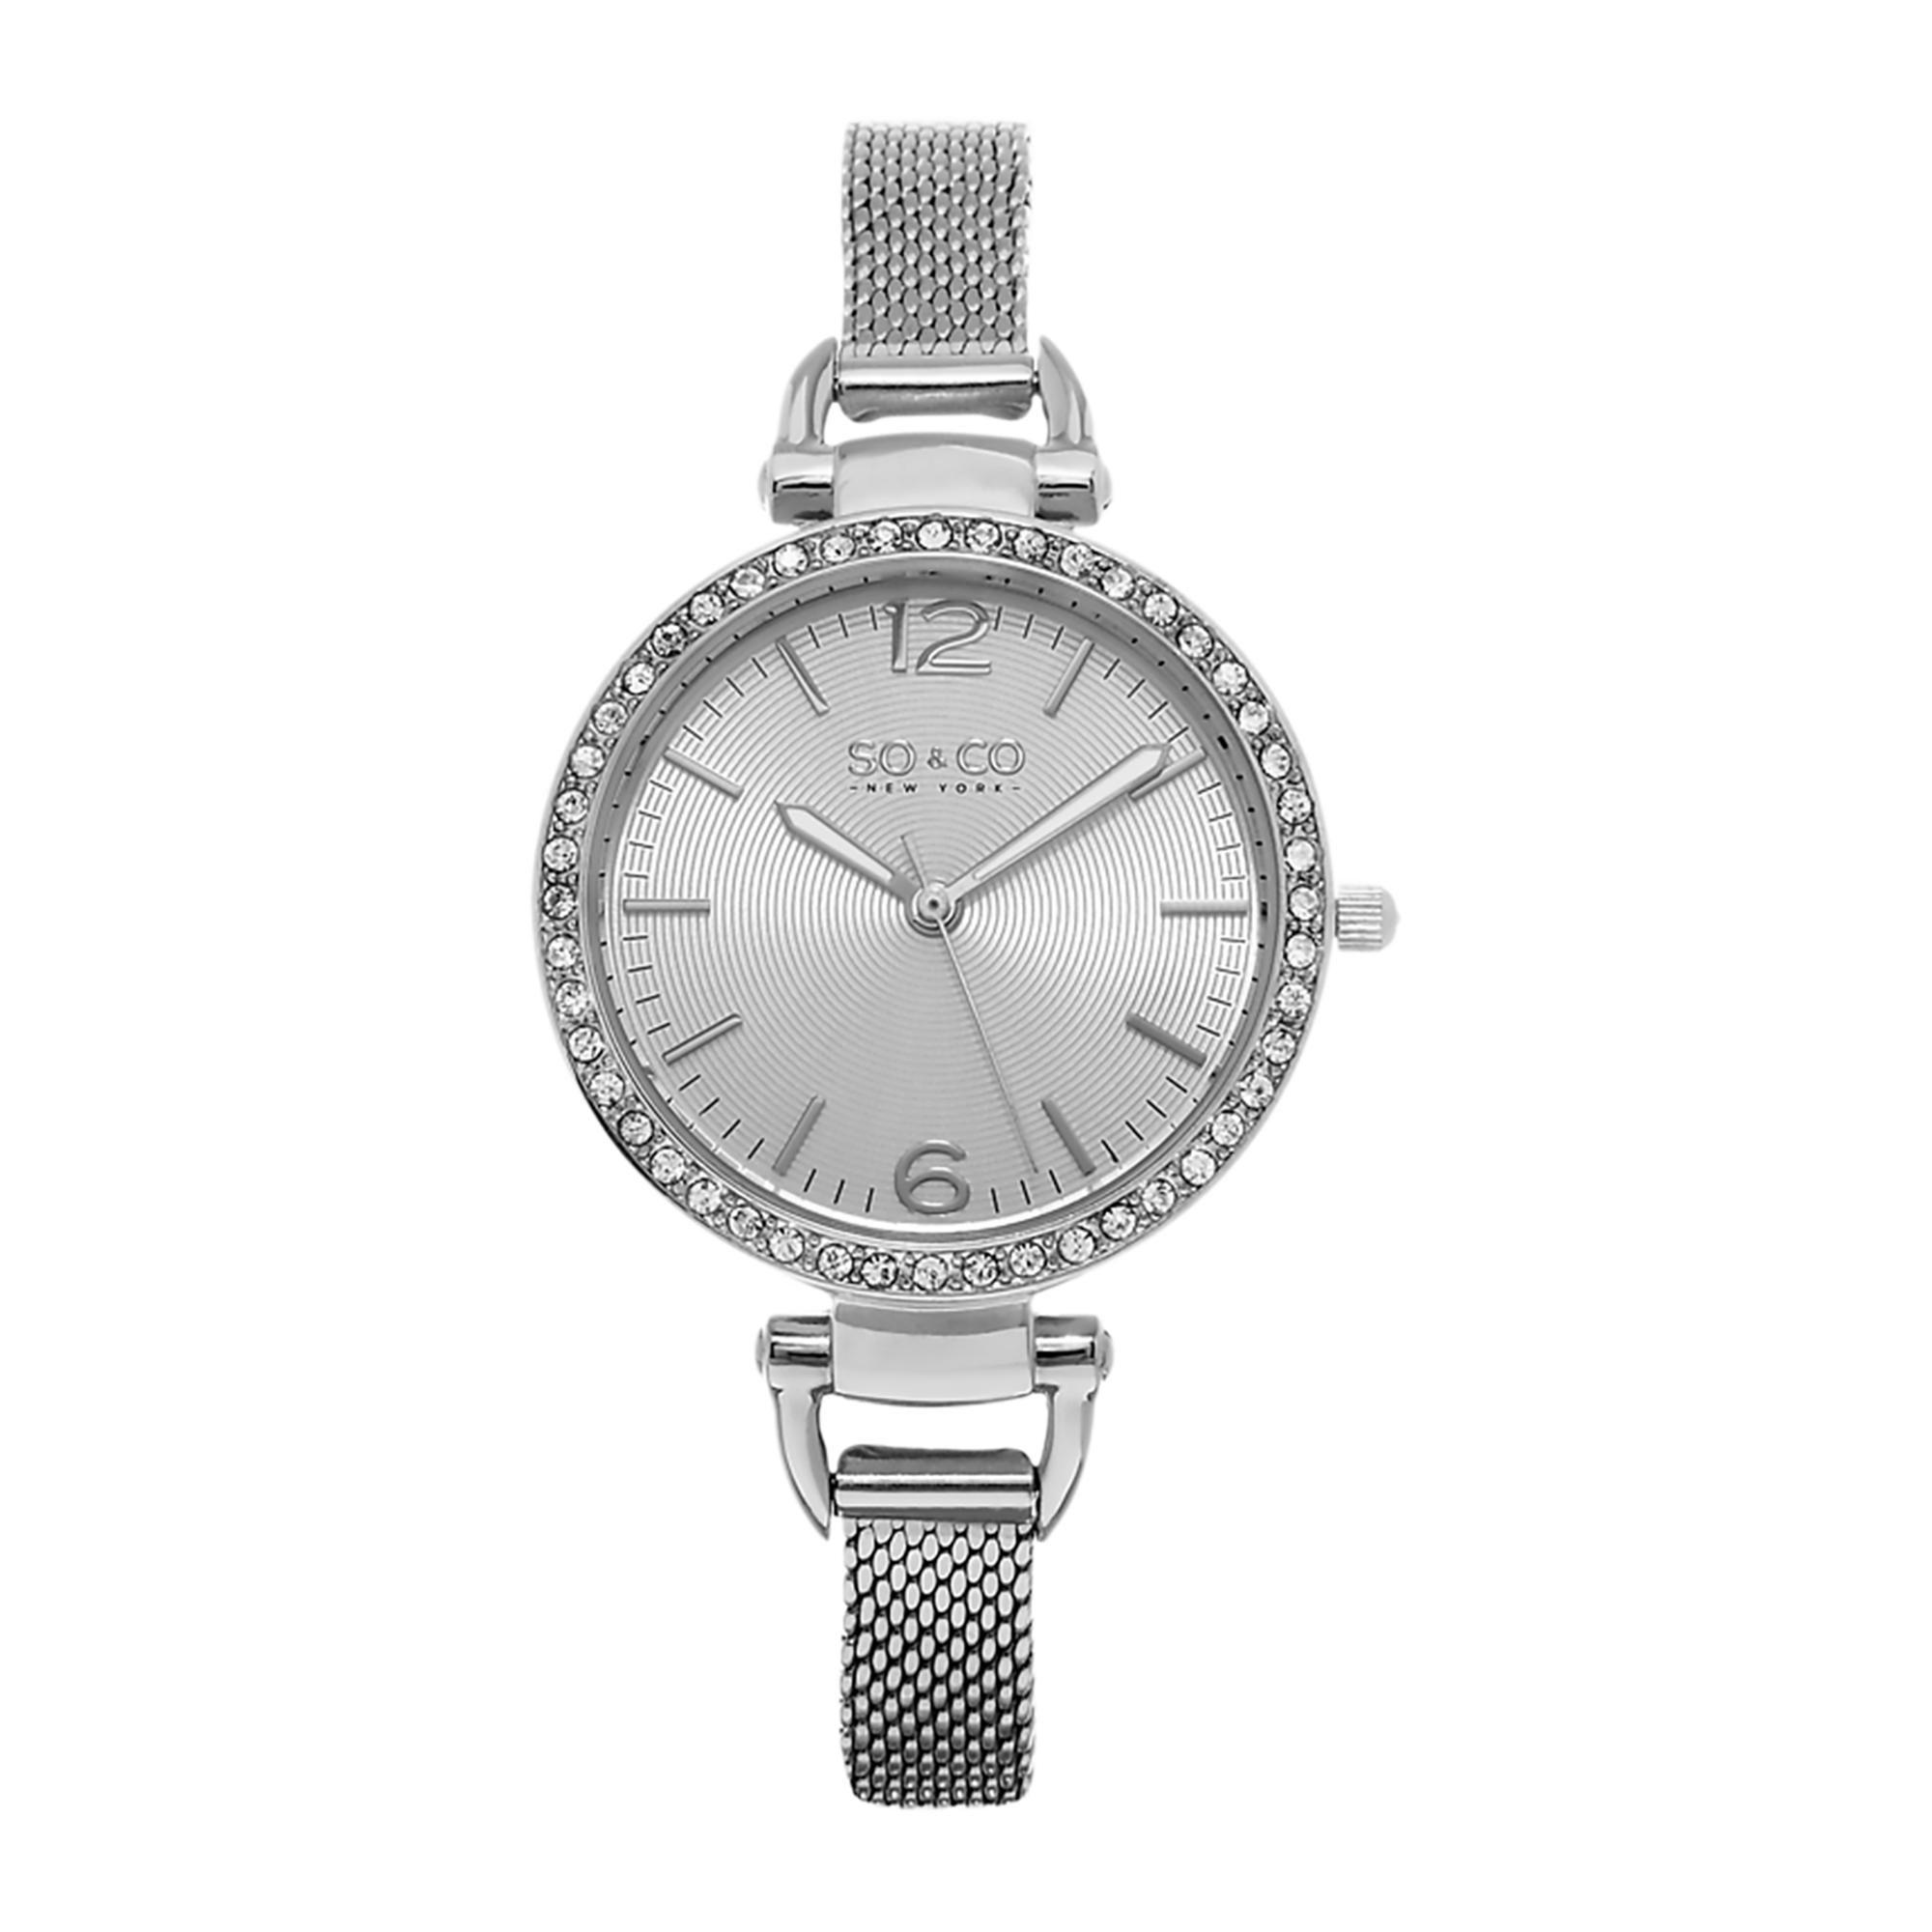 ساعت زنانه برند سو اند کو مدل 5061m.1